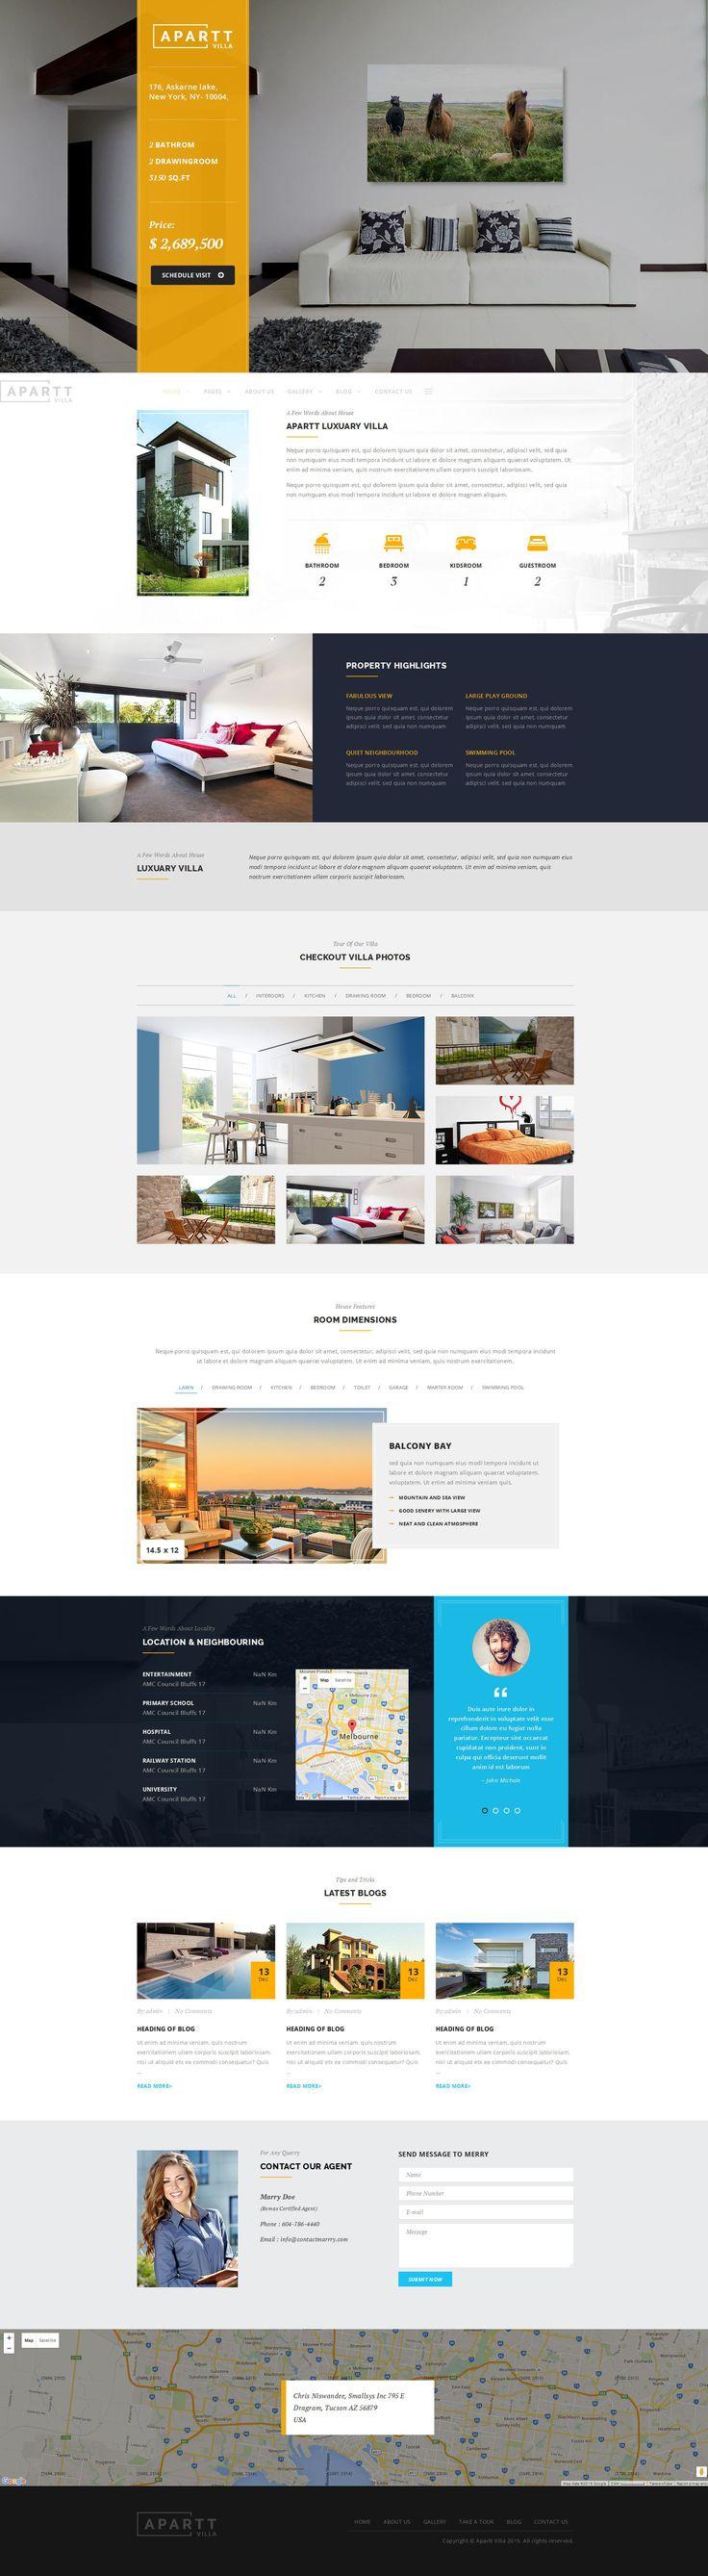 55 Best WordPress Real Estate Themes – June 2016